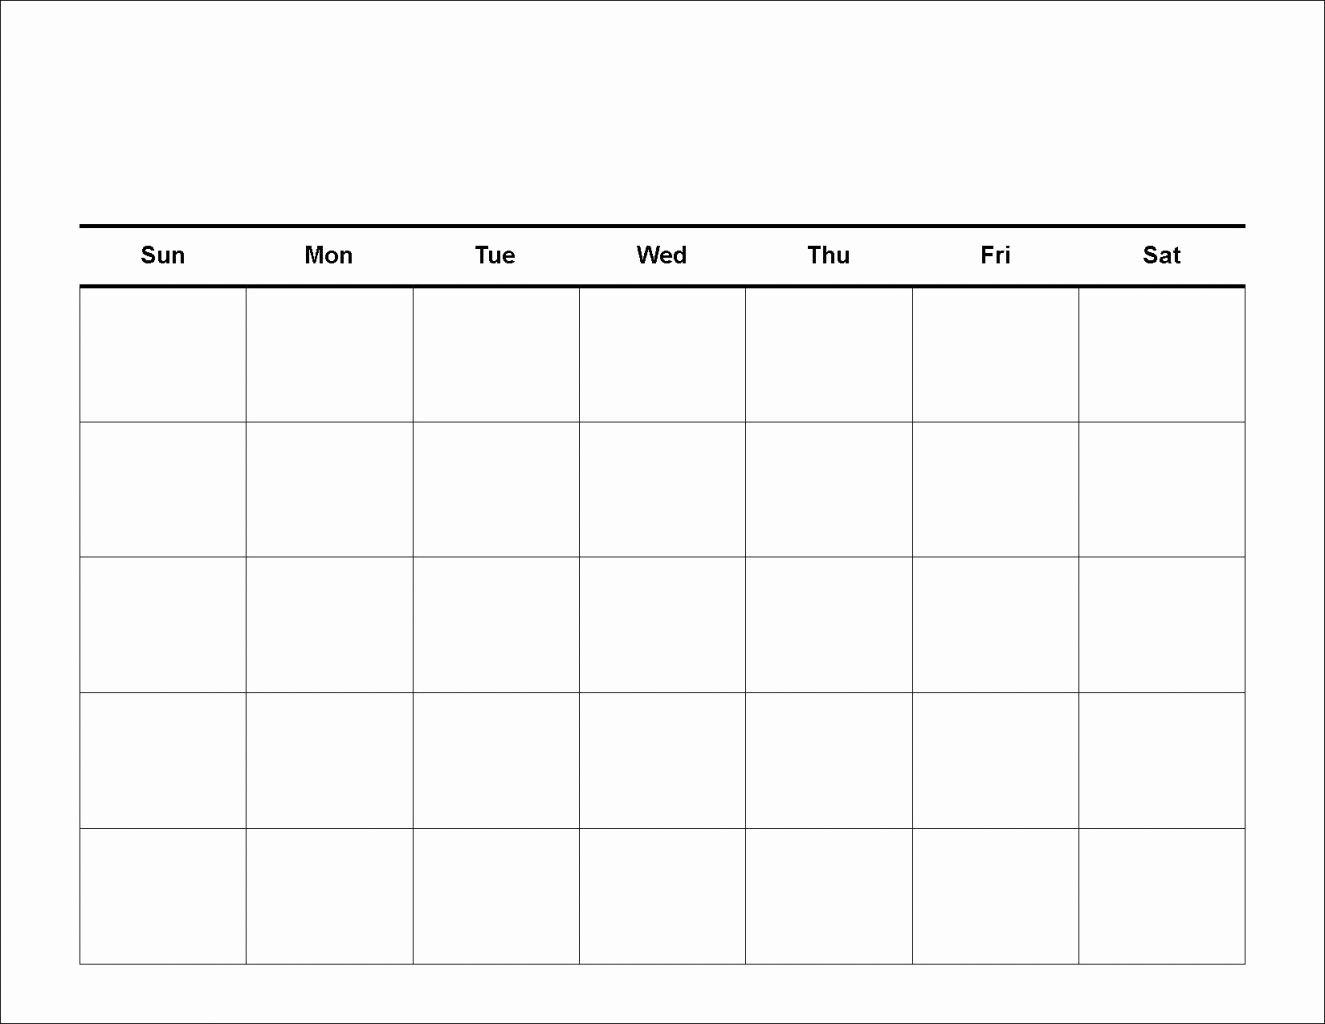 Fitness Calendar 2018 Printable 5 Day Work Week Calendar Template Catch 플래너 템플릿 주간계획표 템플릿